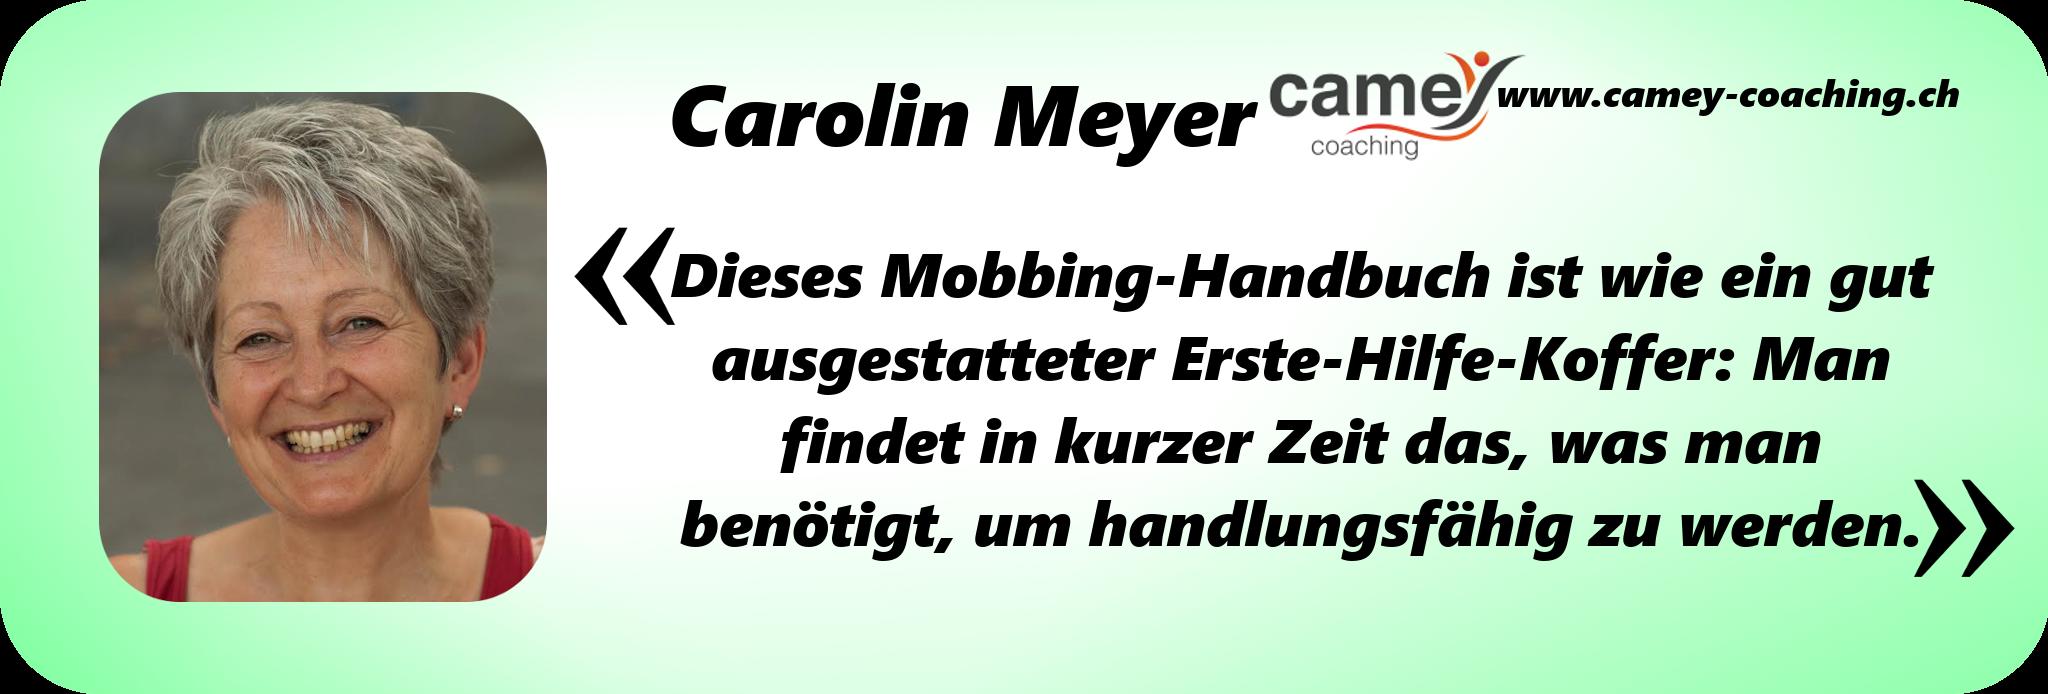 Testimonial-dasmobbinghandbuch-carolinmeyer